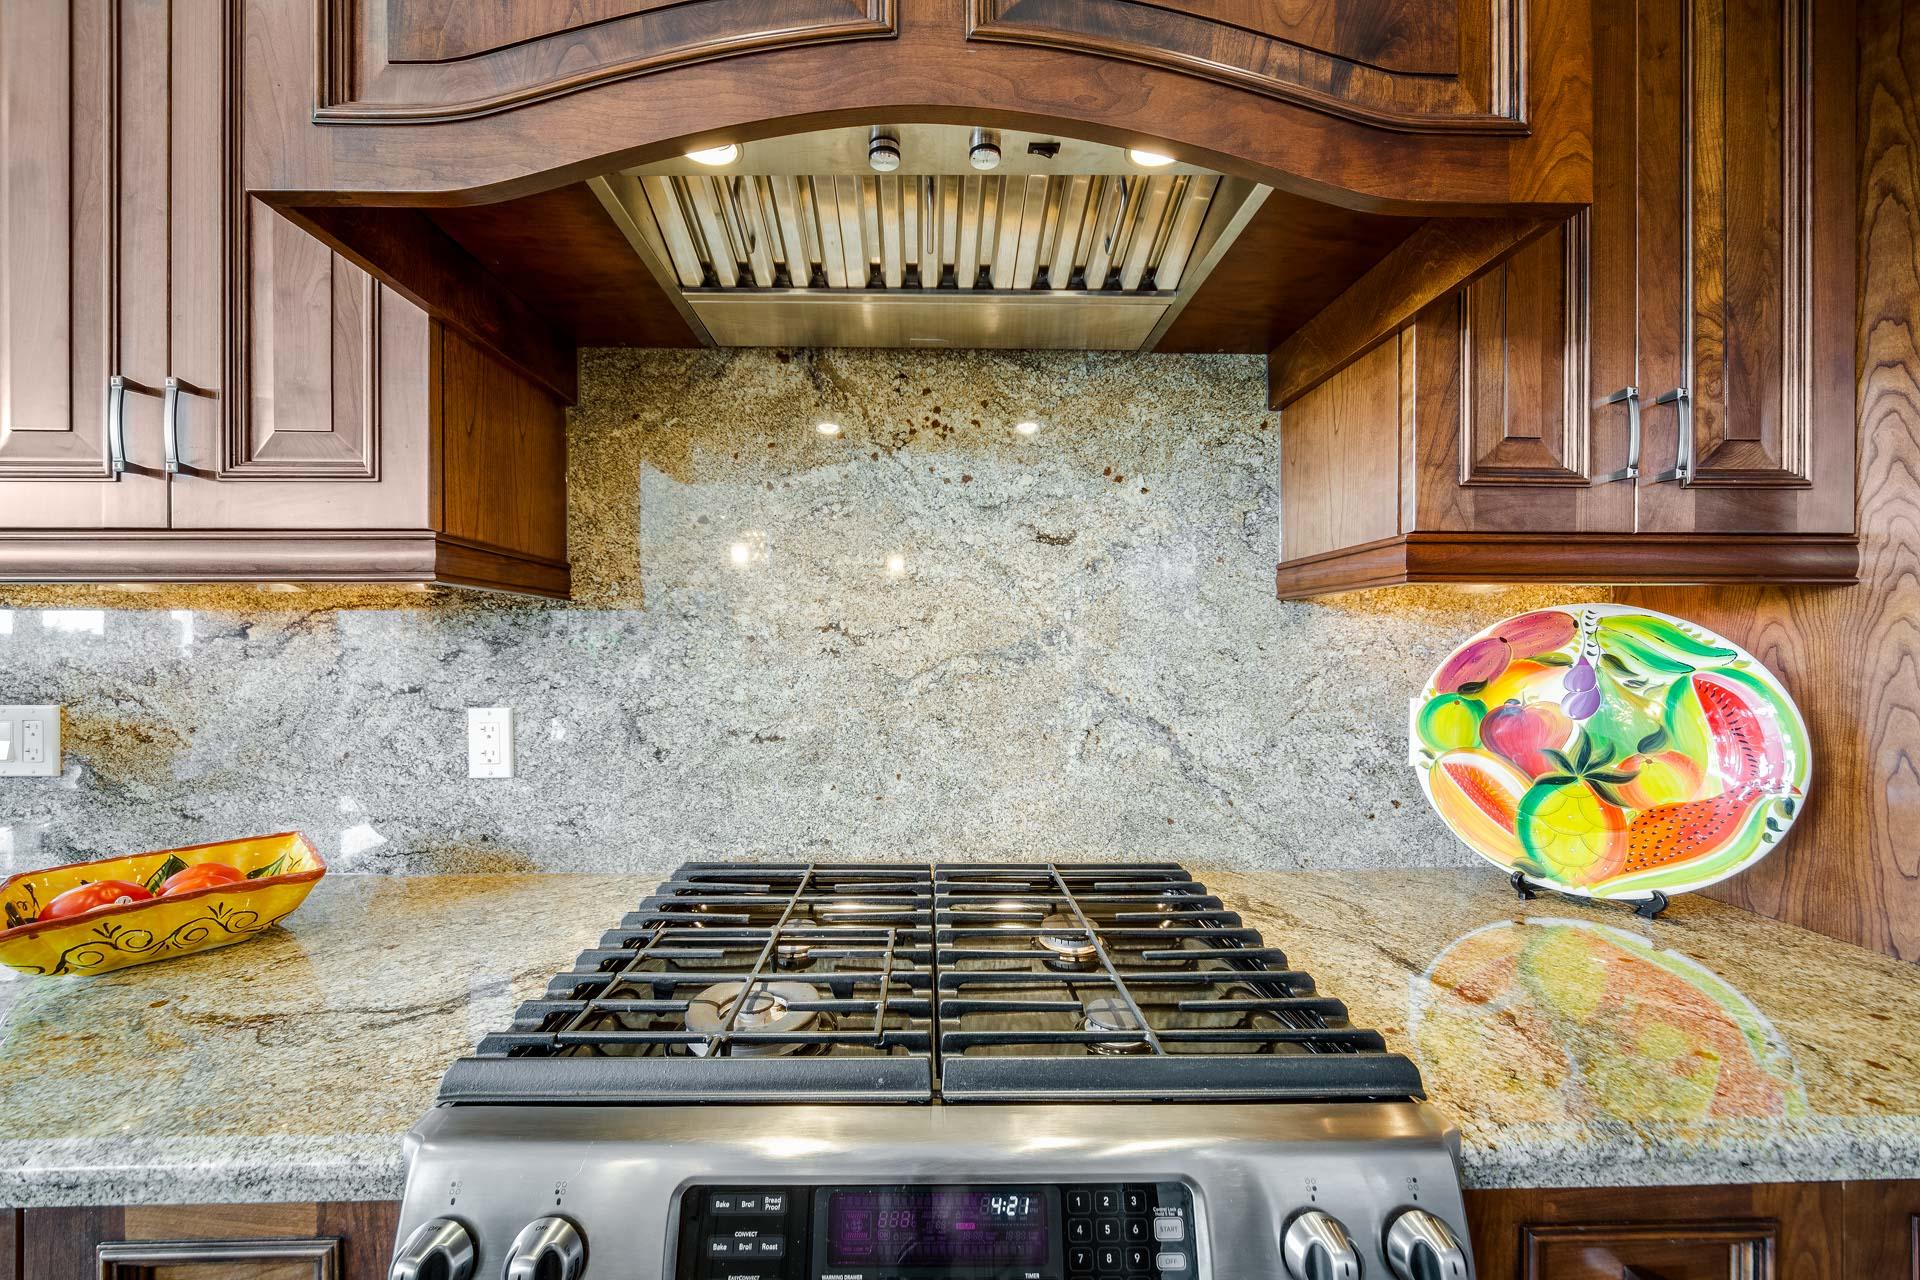 Kitchen Aid Appliances